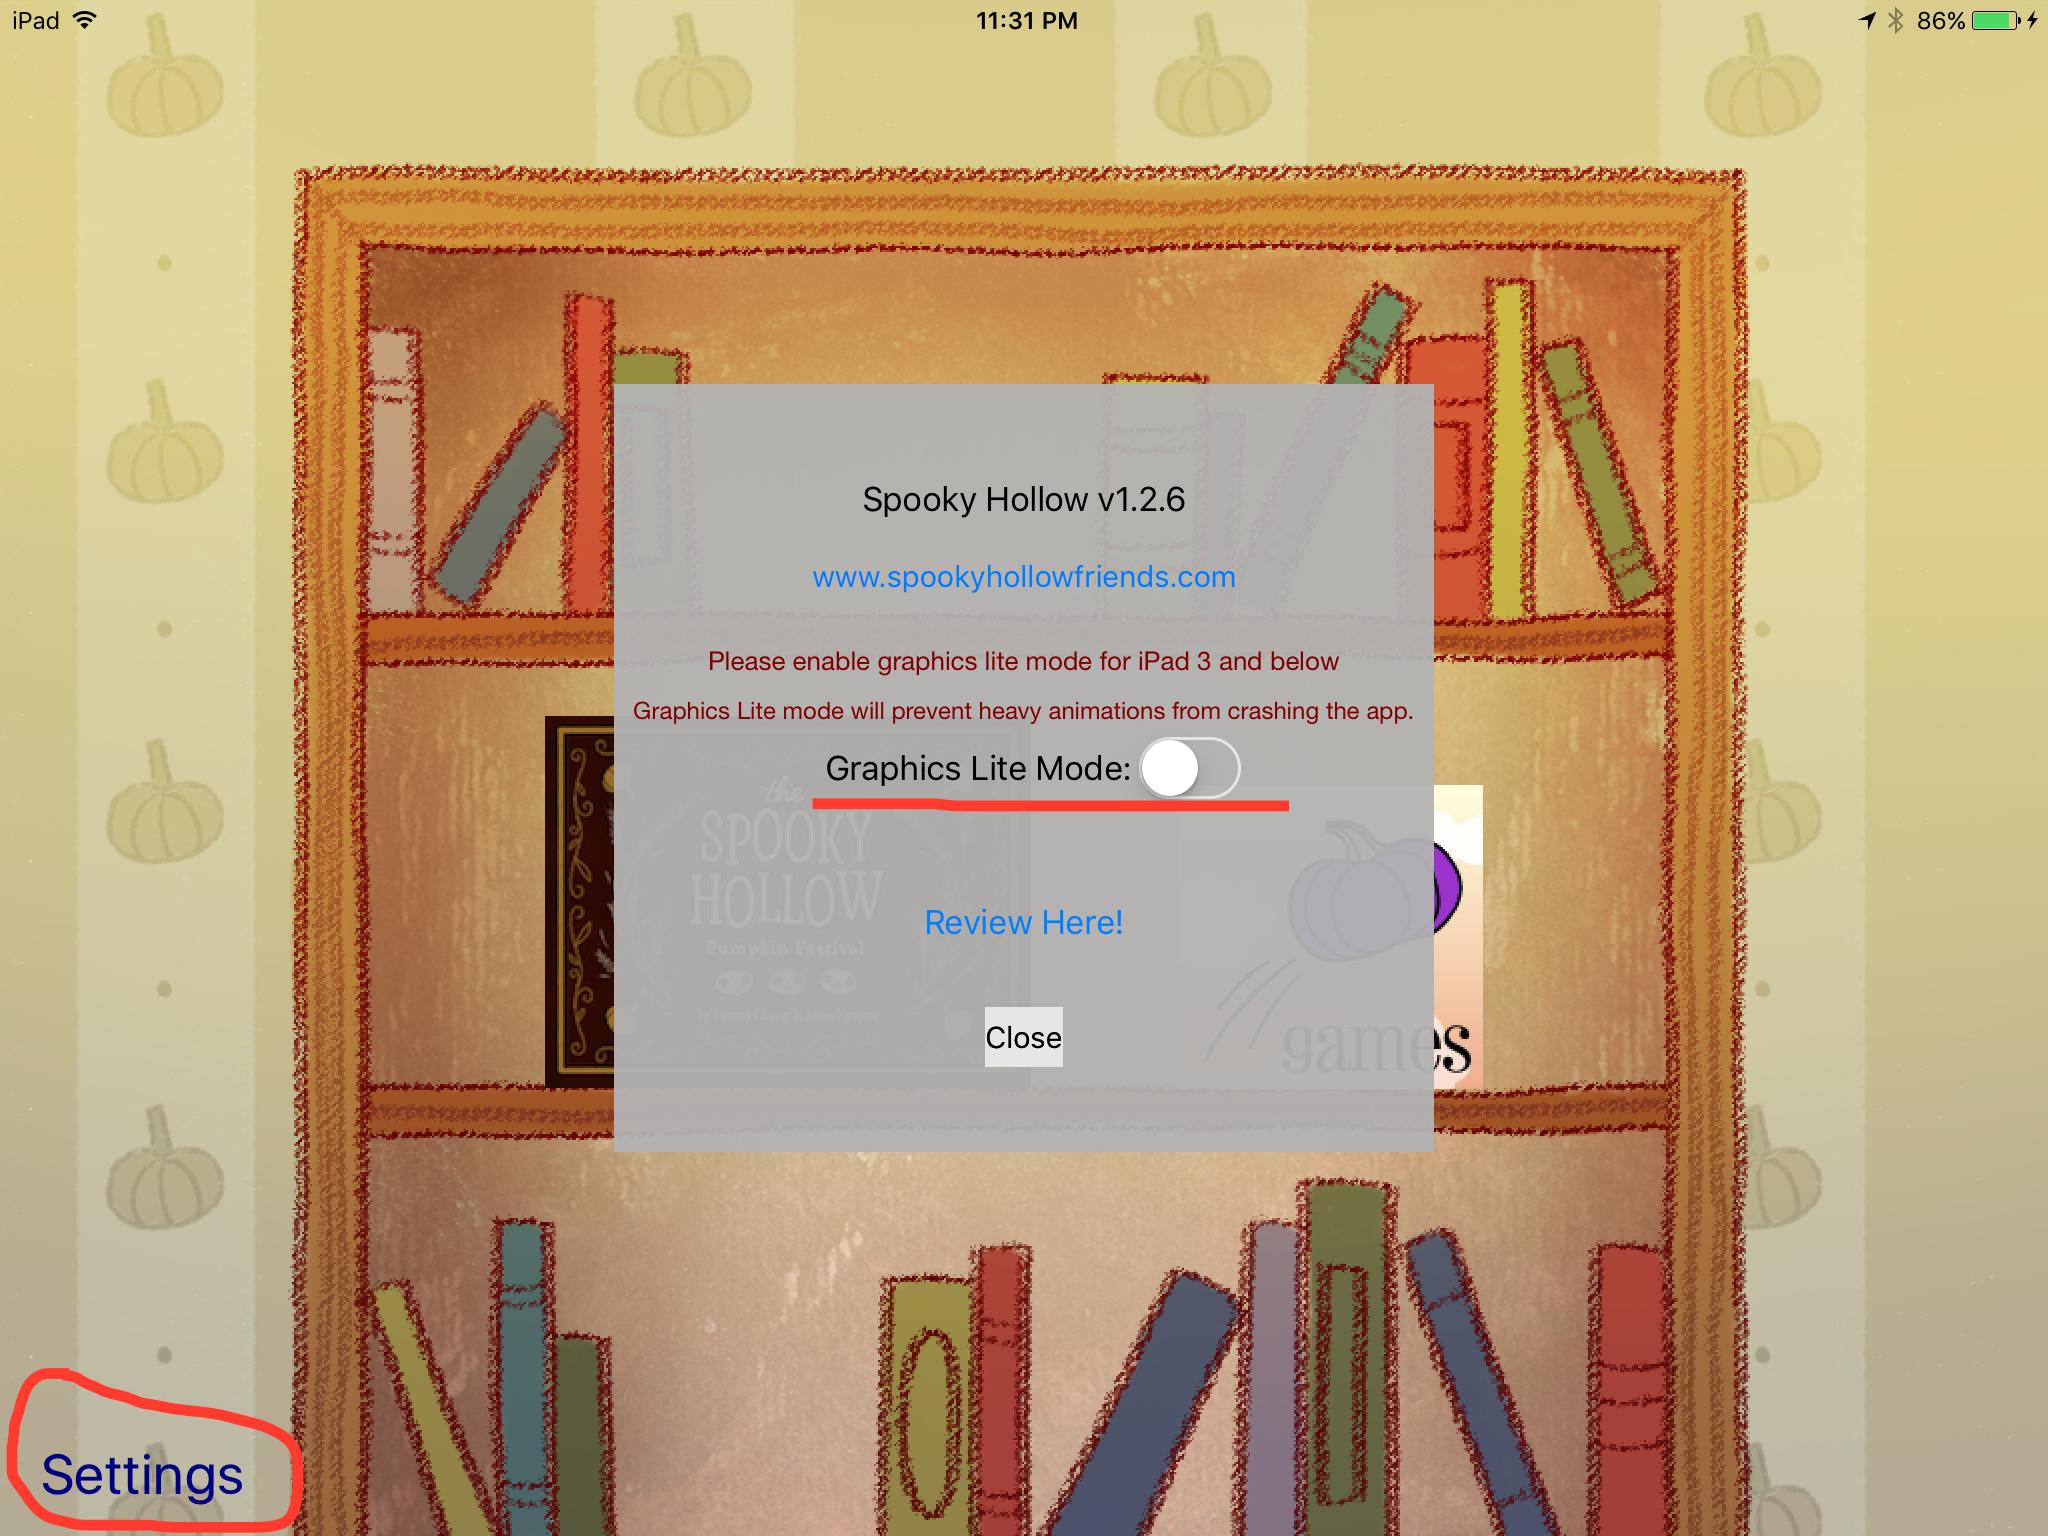 Enabling/Disabling Graphics Lite Mode